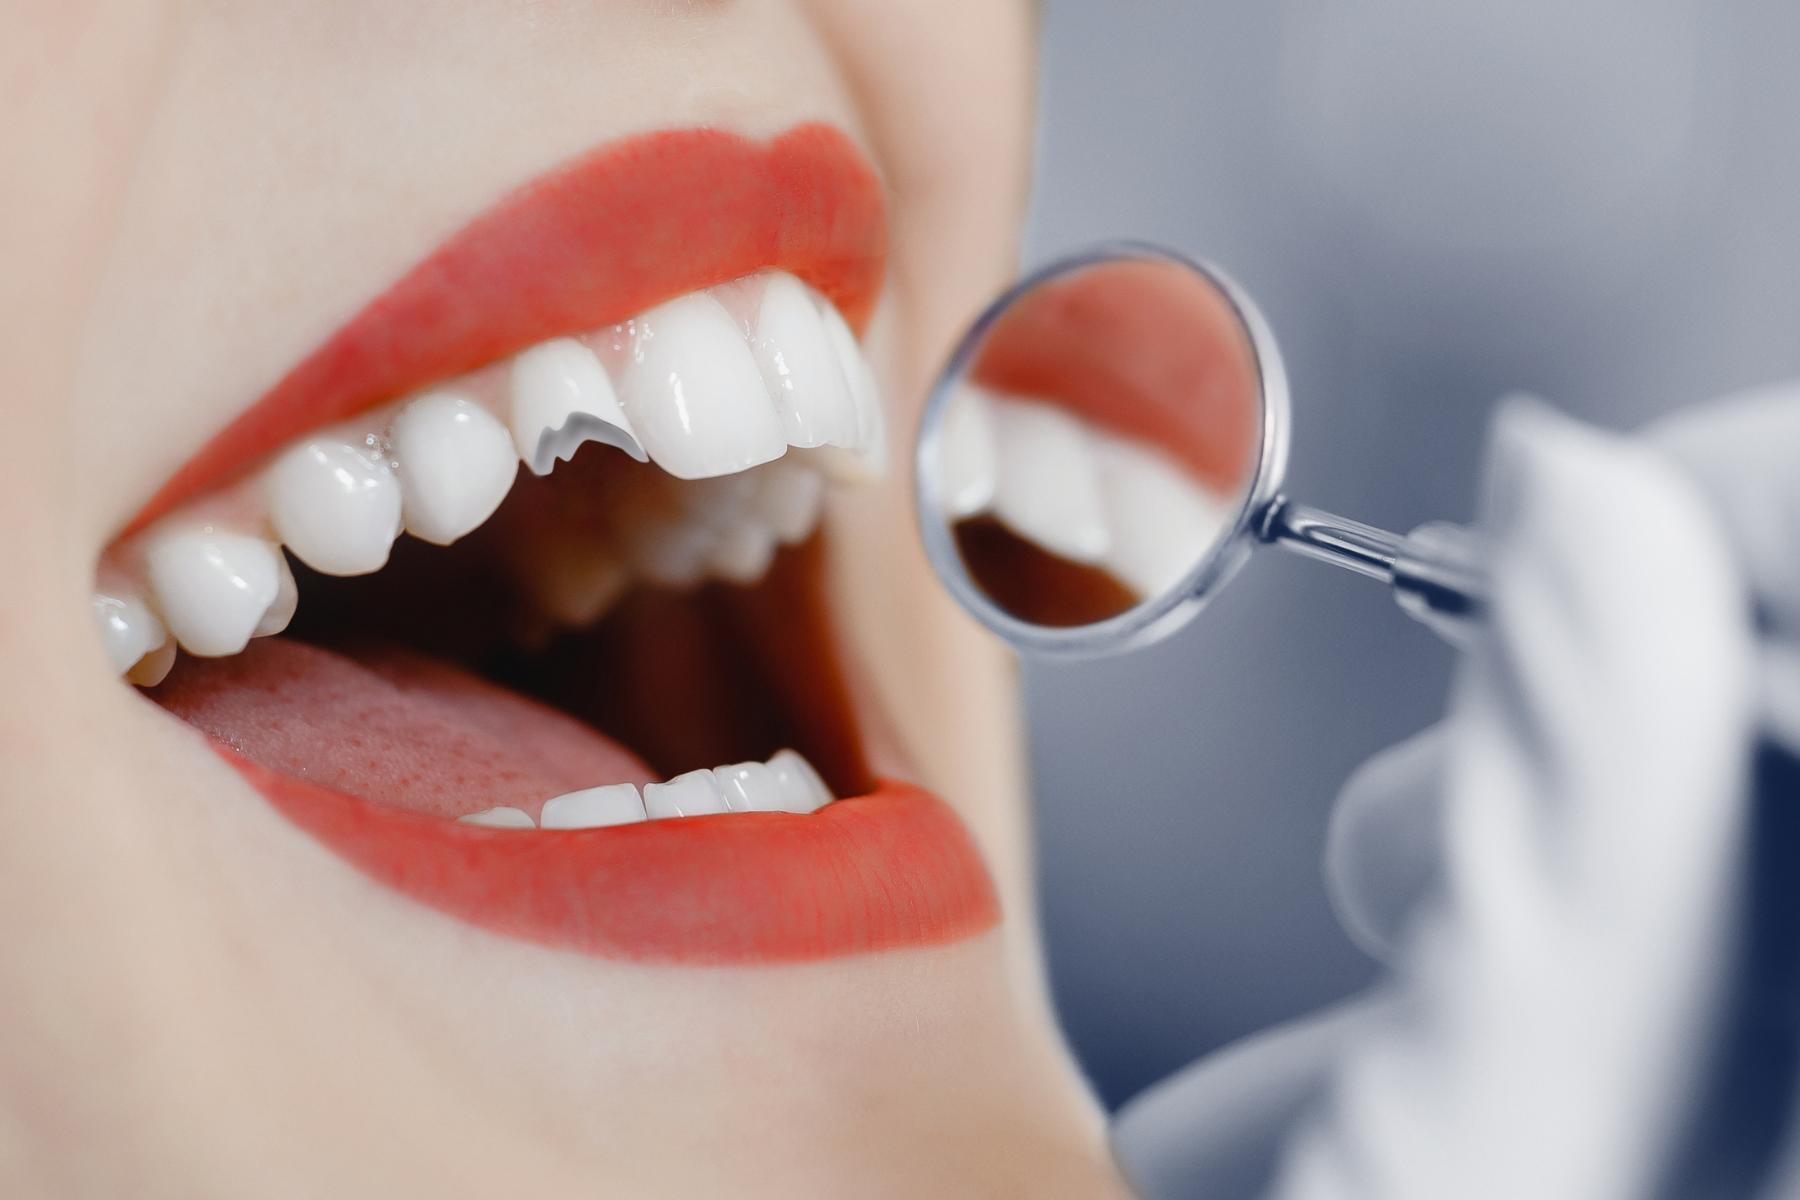 Ways to fix a broken tooth